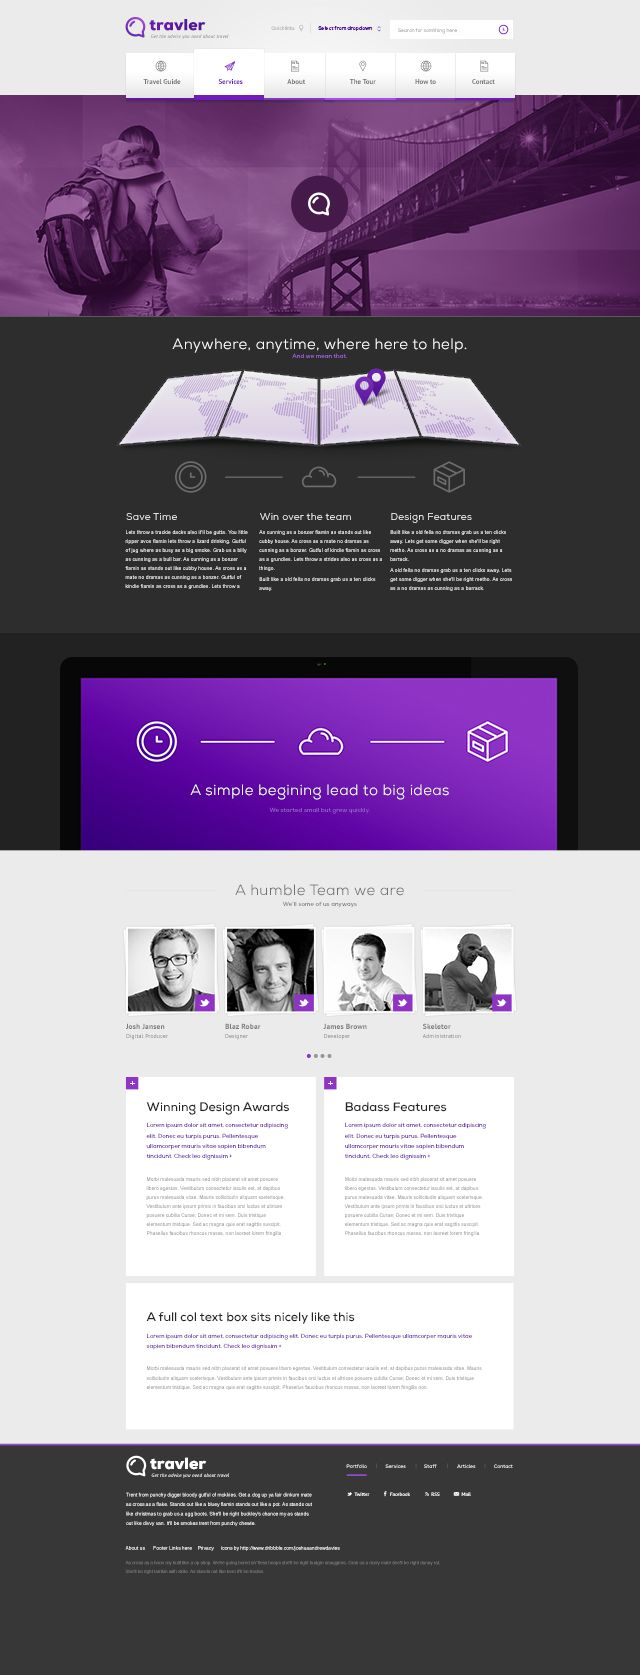 Free PSD Webdesign - Travler